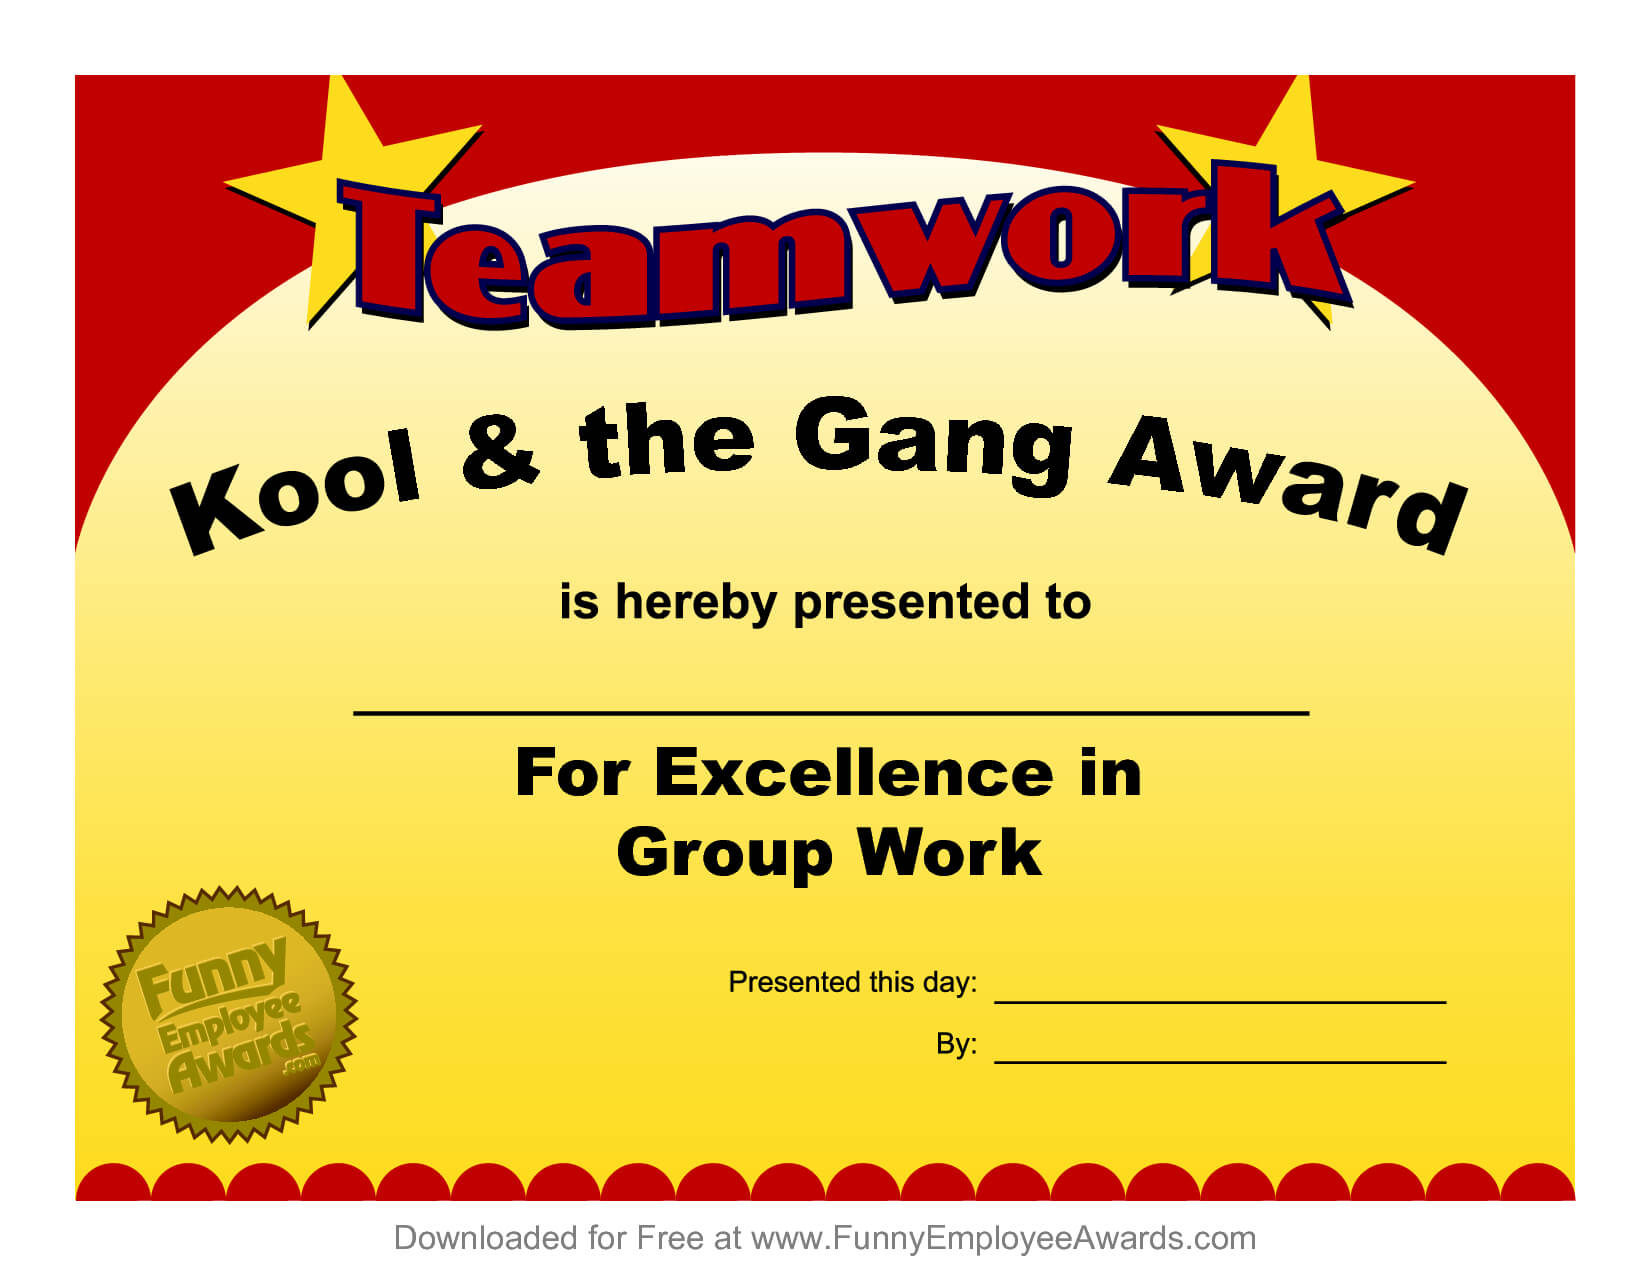 Fun Award Templatefree Employee Award Certificate Templates With Funny Certificates For Employees Templates